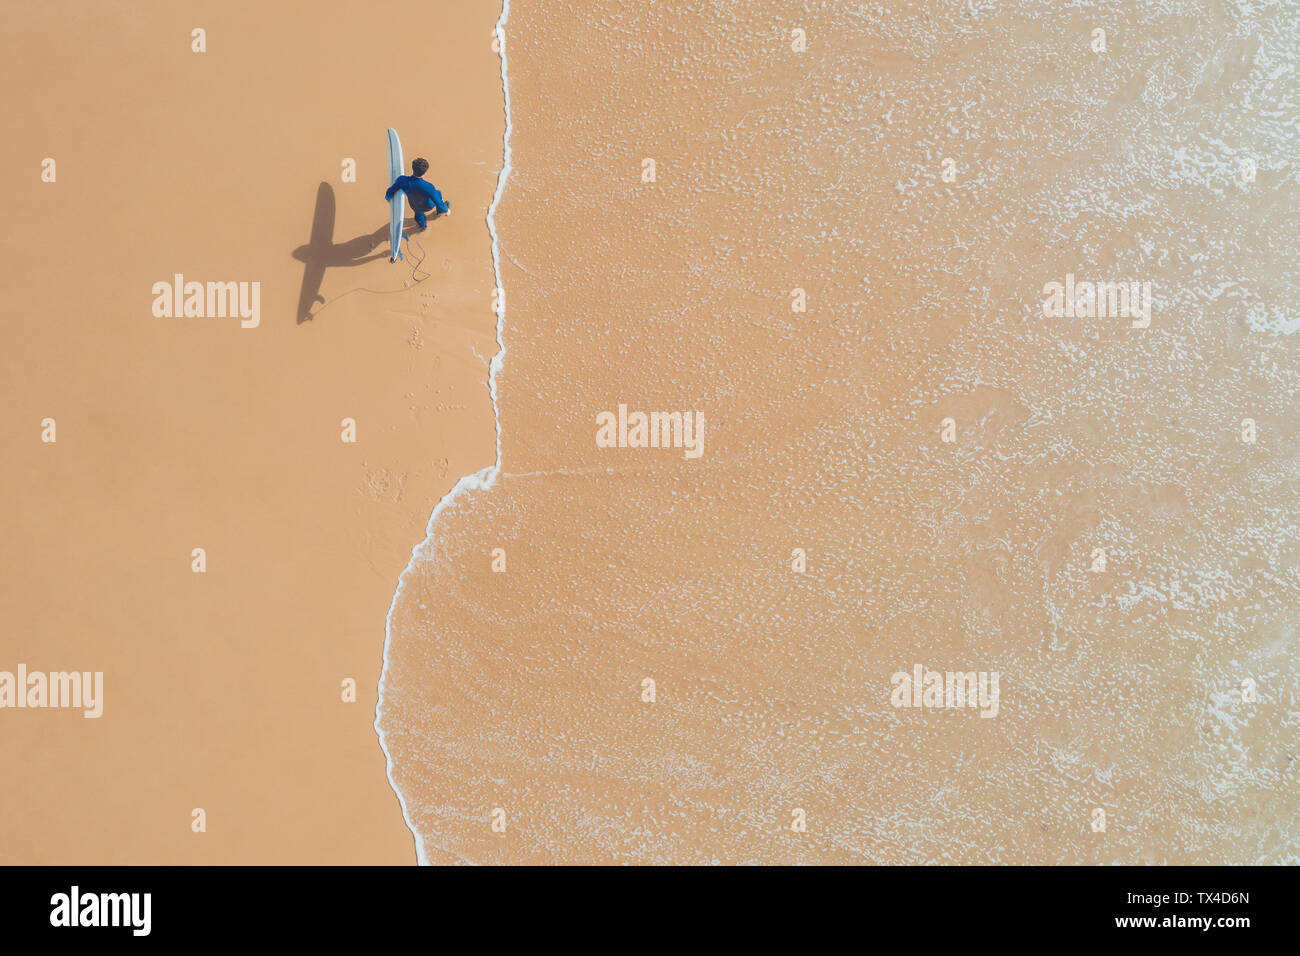 Portugal, Algarve, Sagres, Praia da Mareta, aerial view of man carrying surfboard on the beach Stock Photo